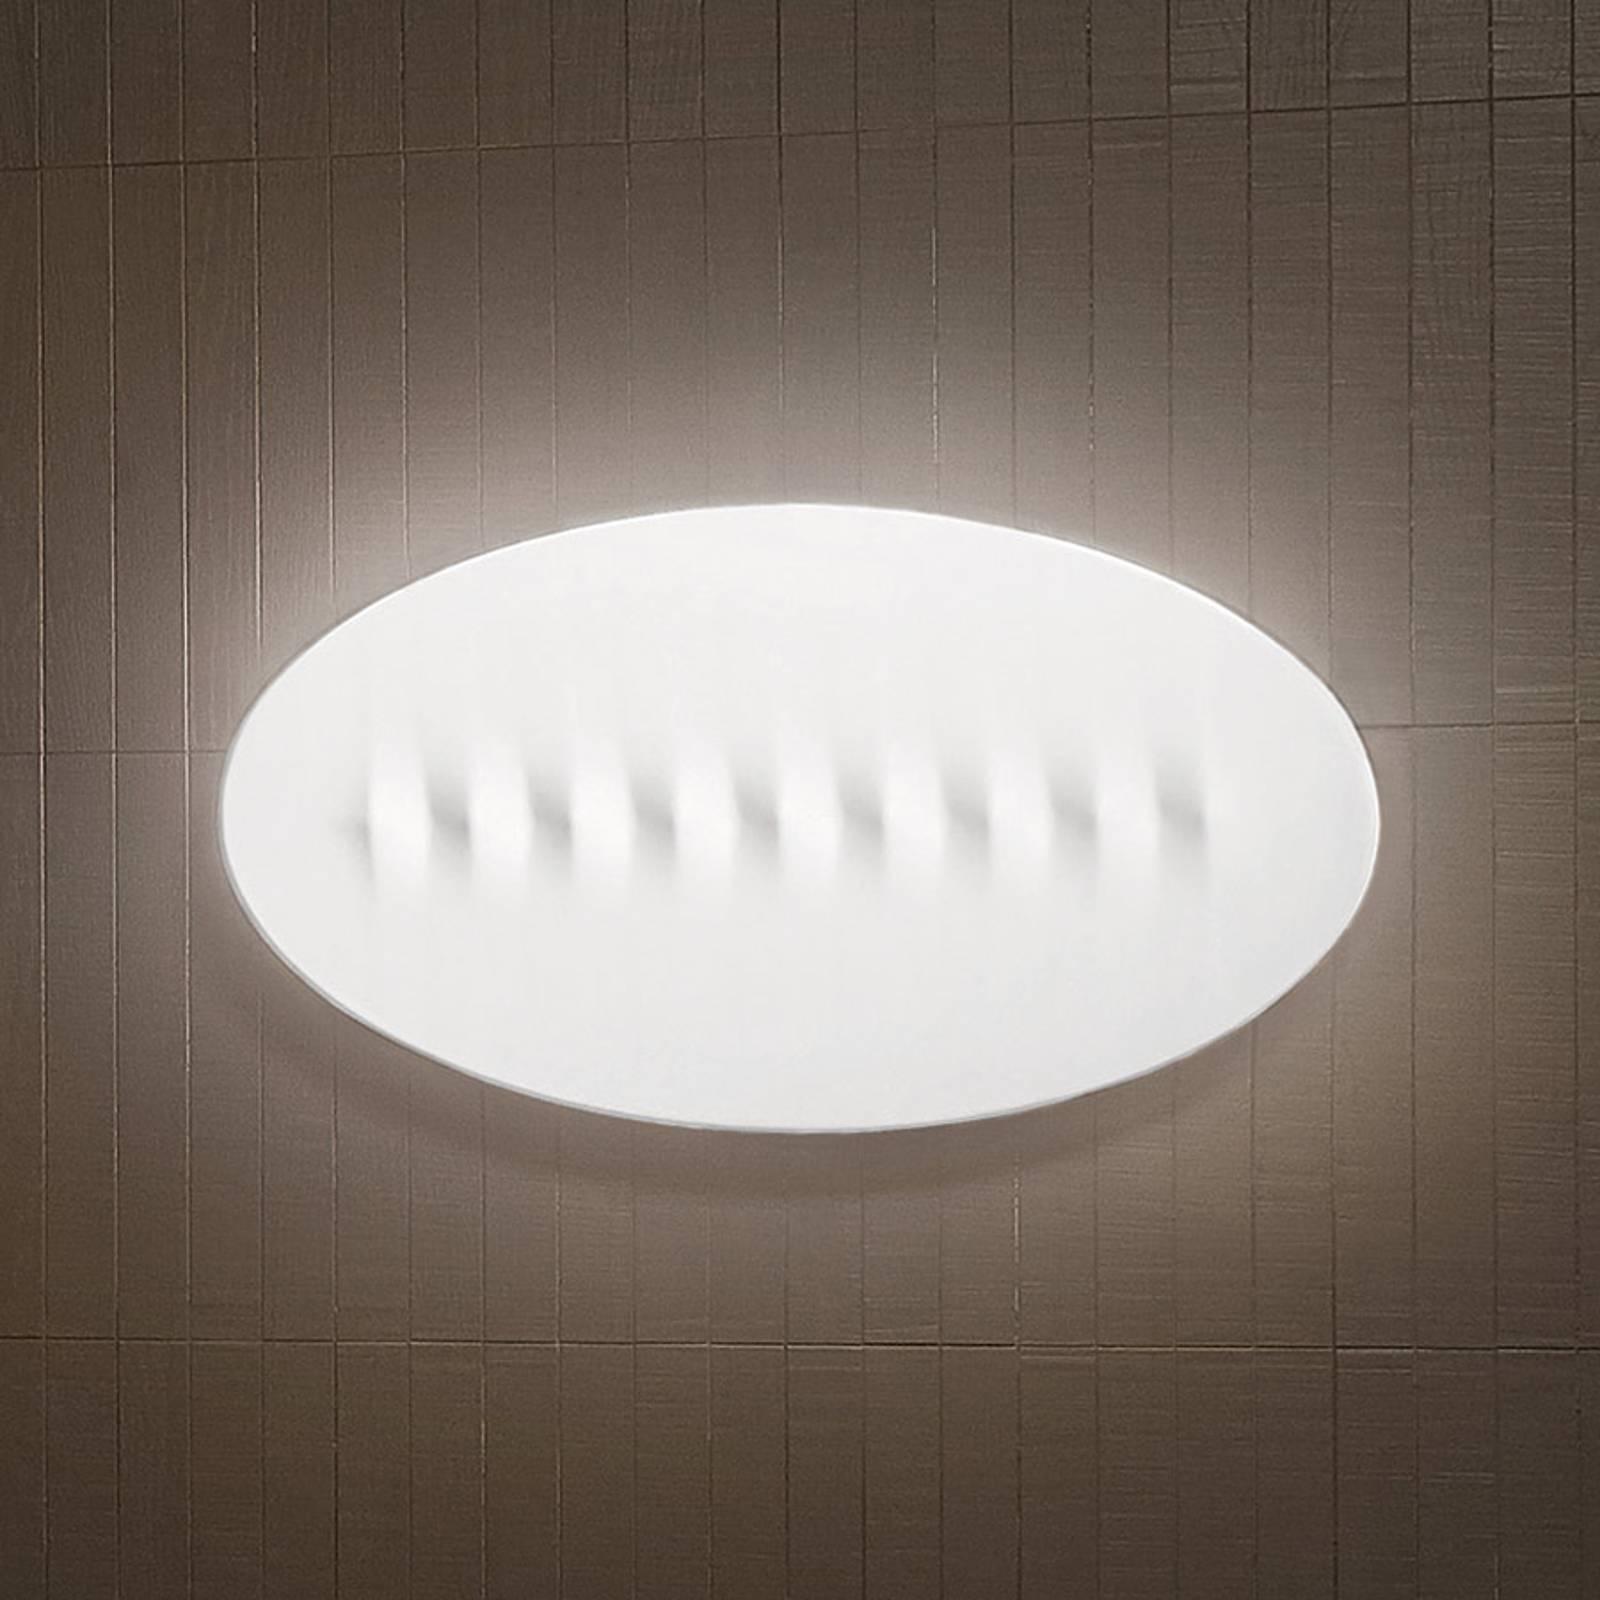 Foscarini MyLight Superficie LED-Wandleuchte, 75cm